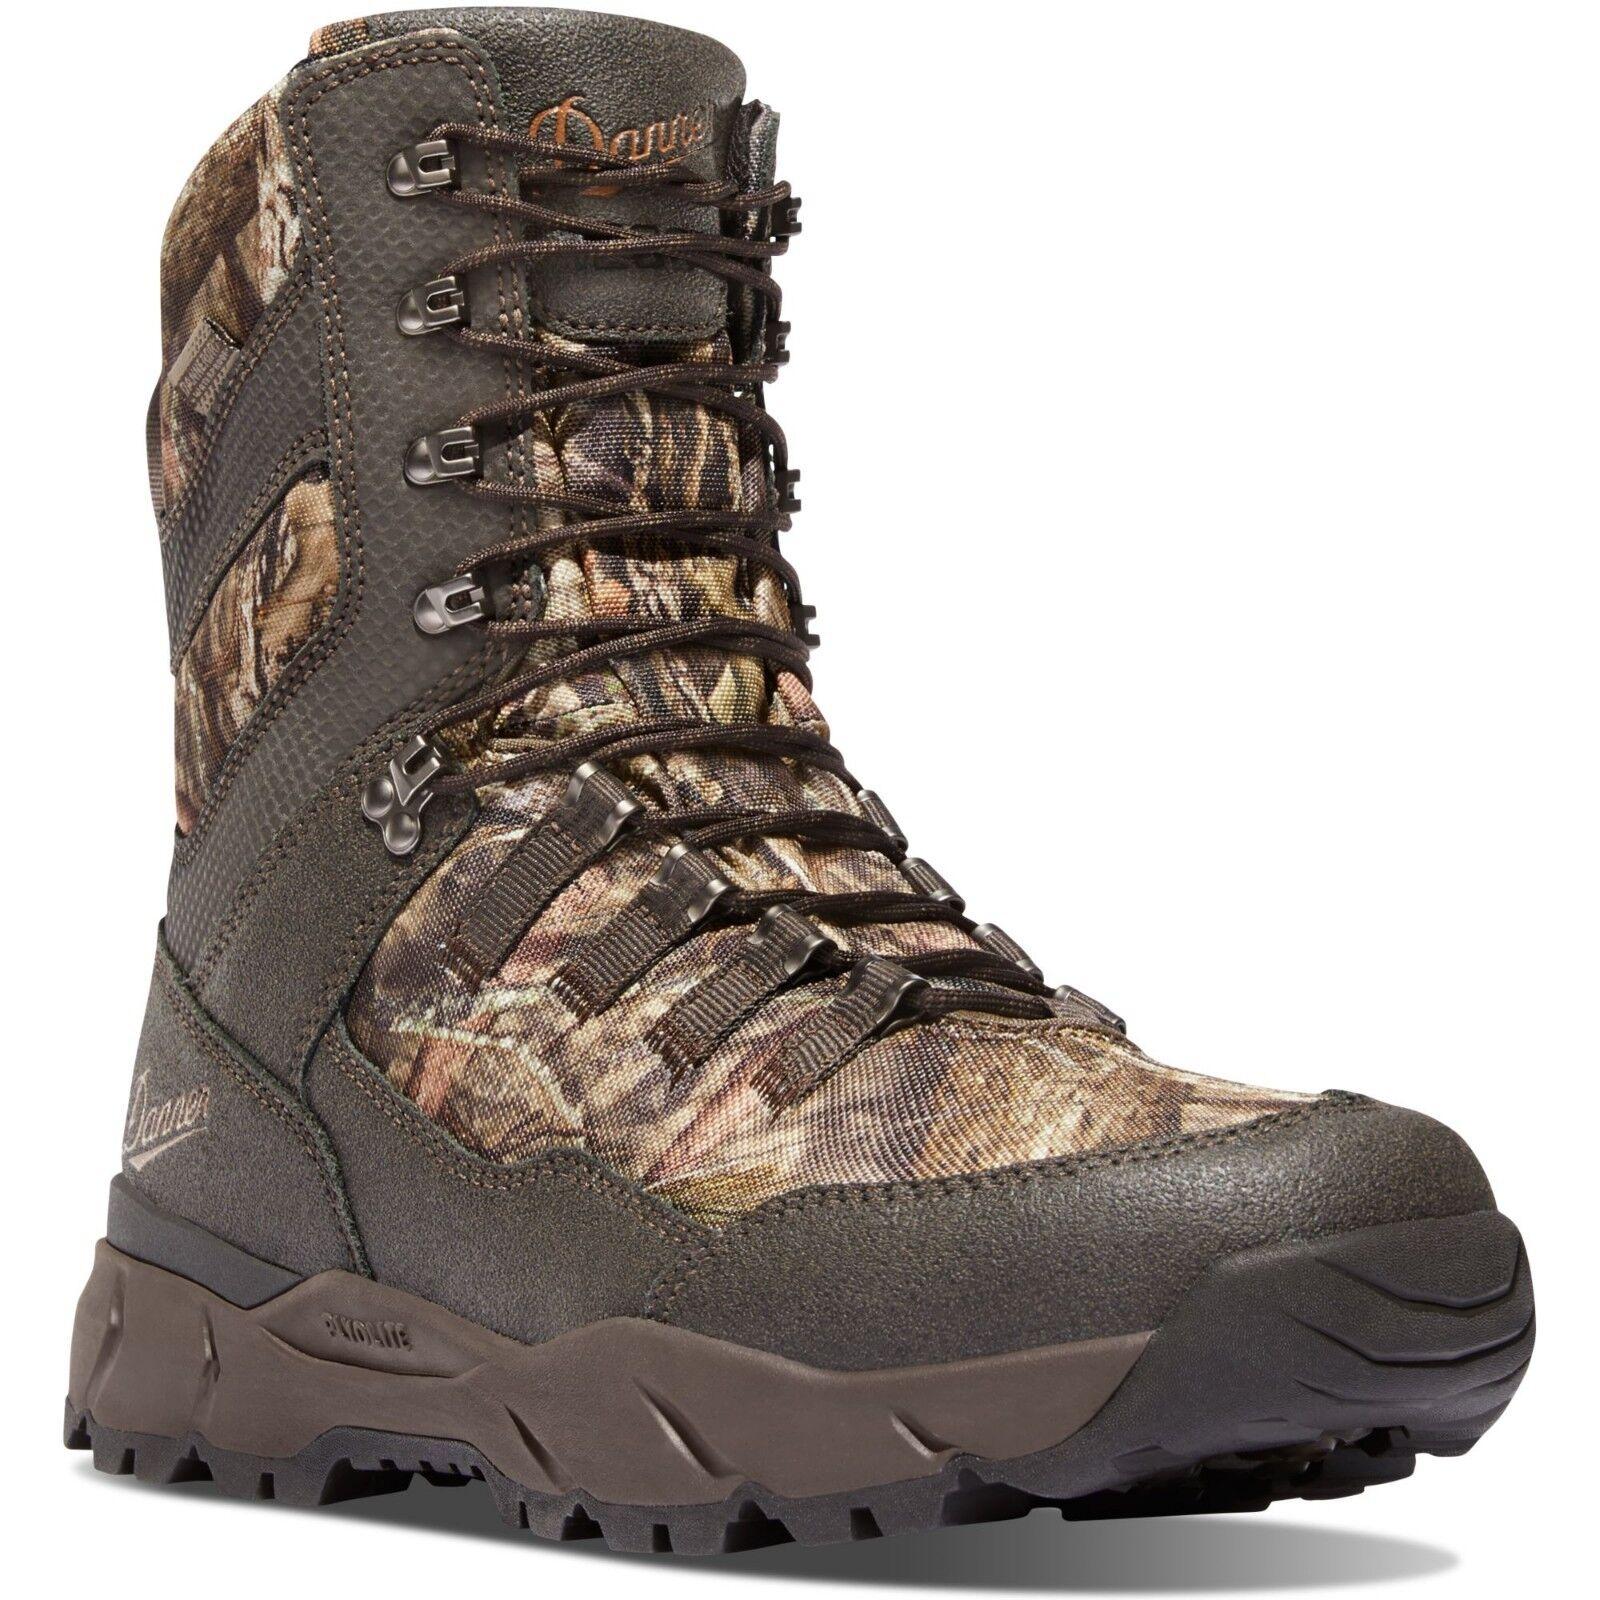 Danner para hombres 41555 8  vital Mossy Oak Camo 1200G Aislado botas de caza